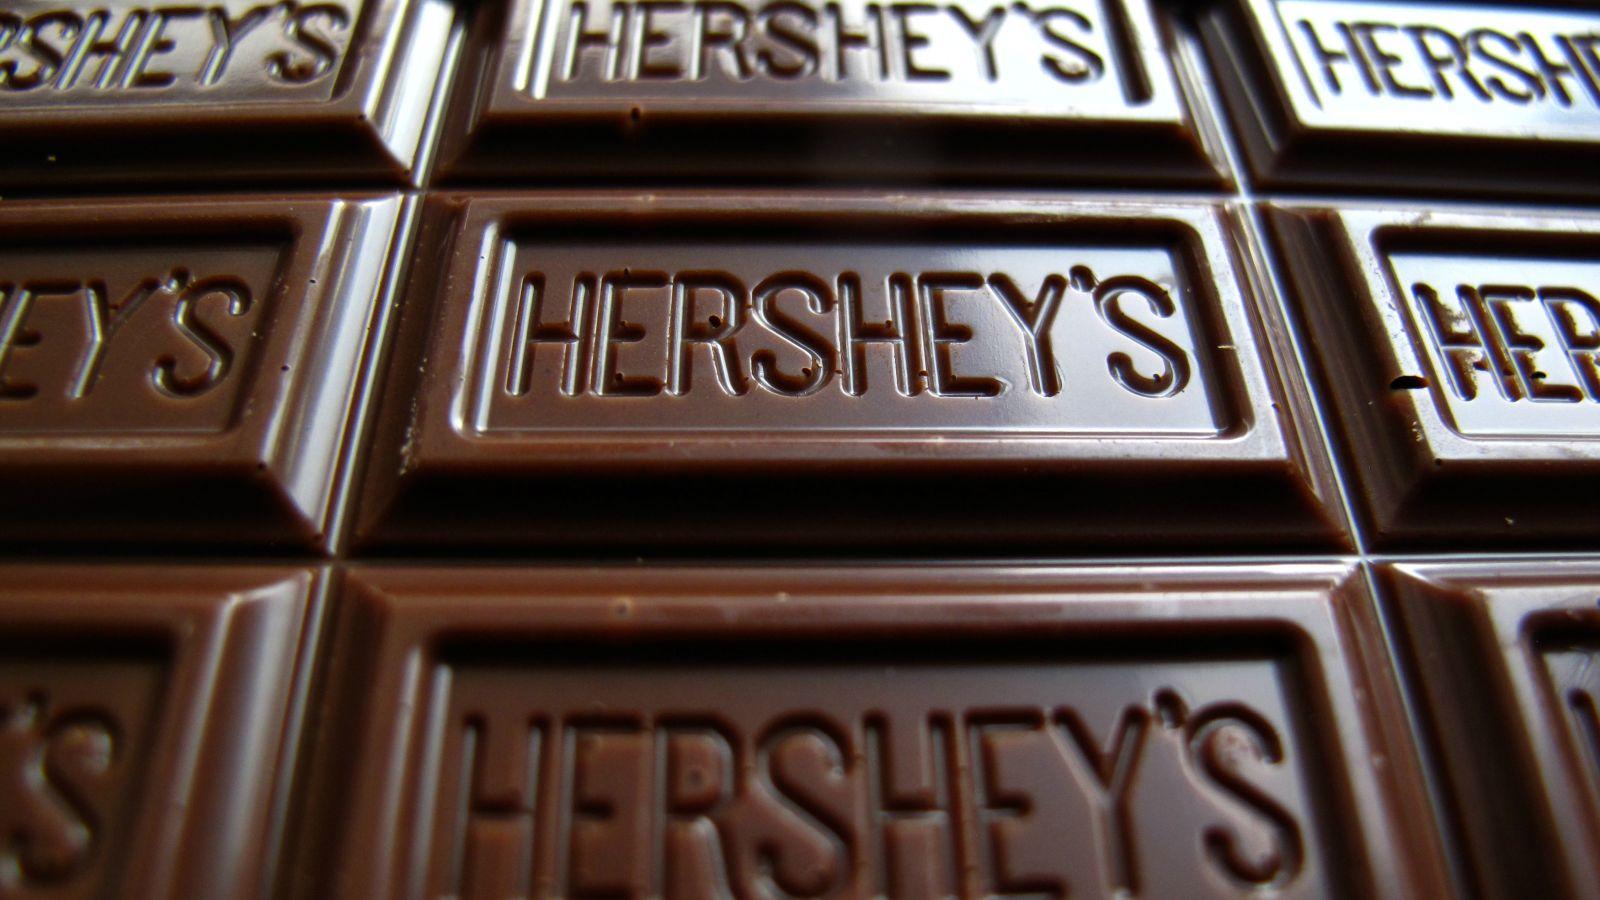 Hershey Chocolate Computer Wallpaper 61713 1600x900px 1600x900